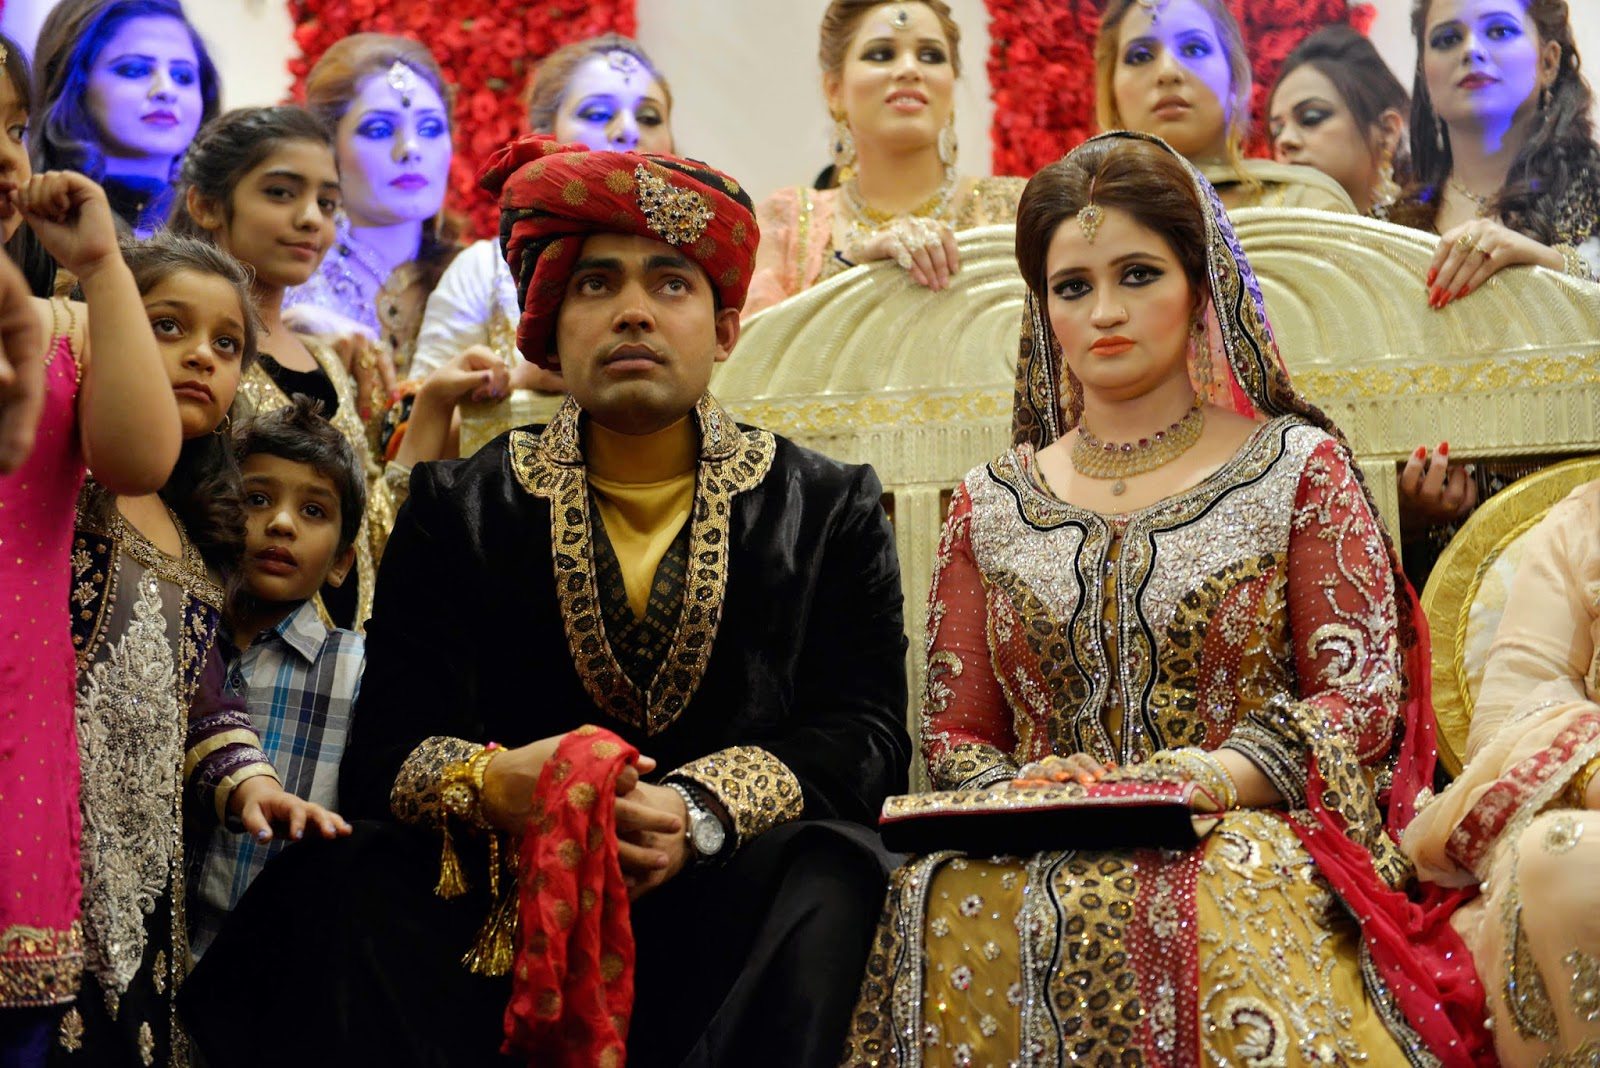 Abdul Qadir, Cricketer, Kamran Akmal, Noor Amna, Pakistan, Sports, Umer Akmal, Umer Akmal Wife, Umer Weeding,